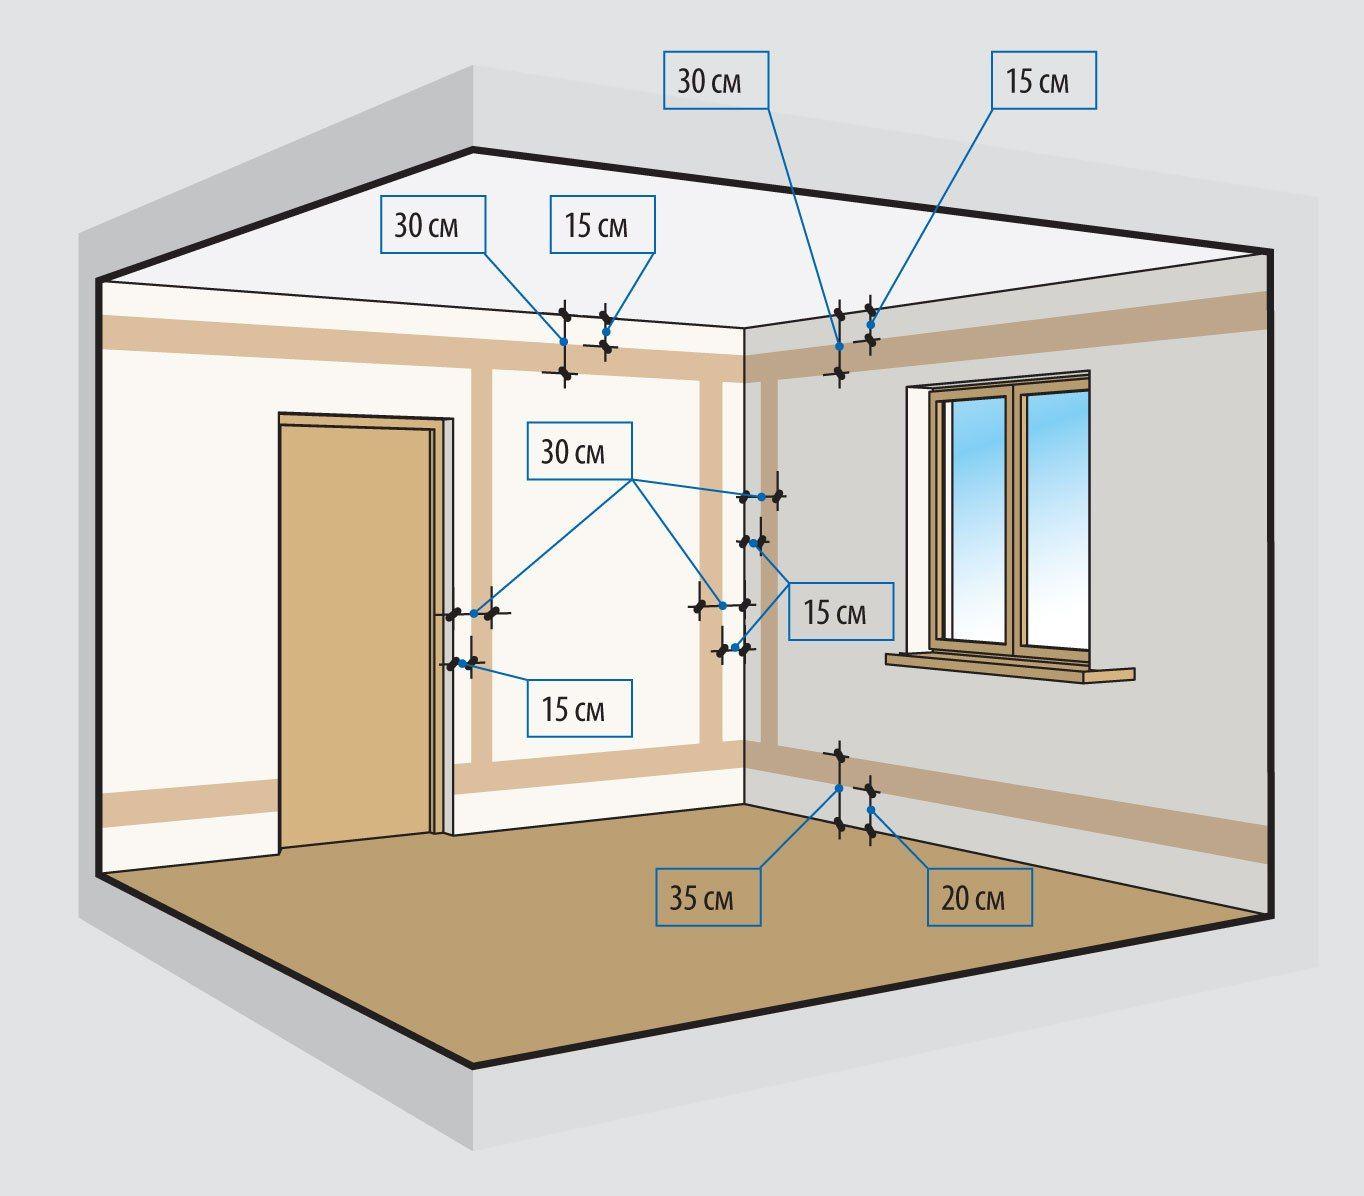 Размерыдляразводки 🔴 Правила разводки электрики в квартире